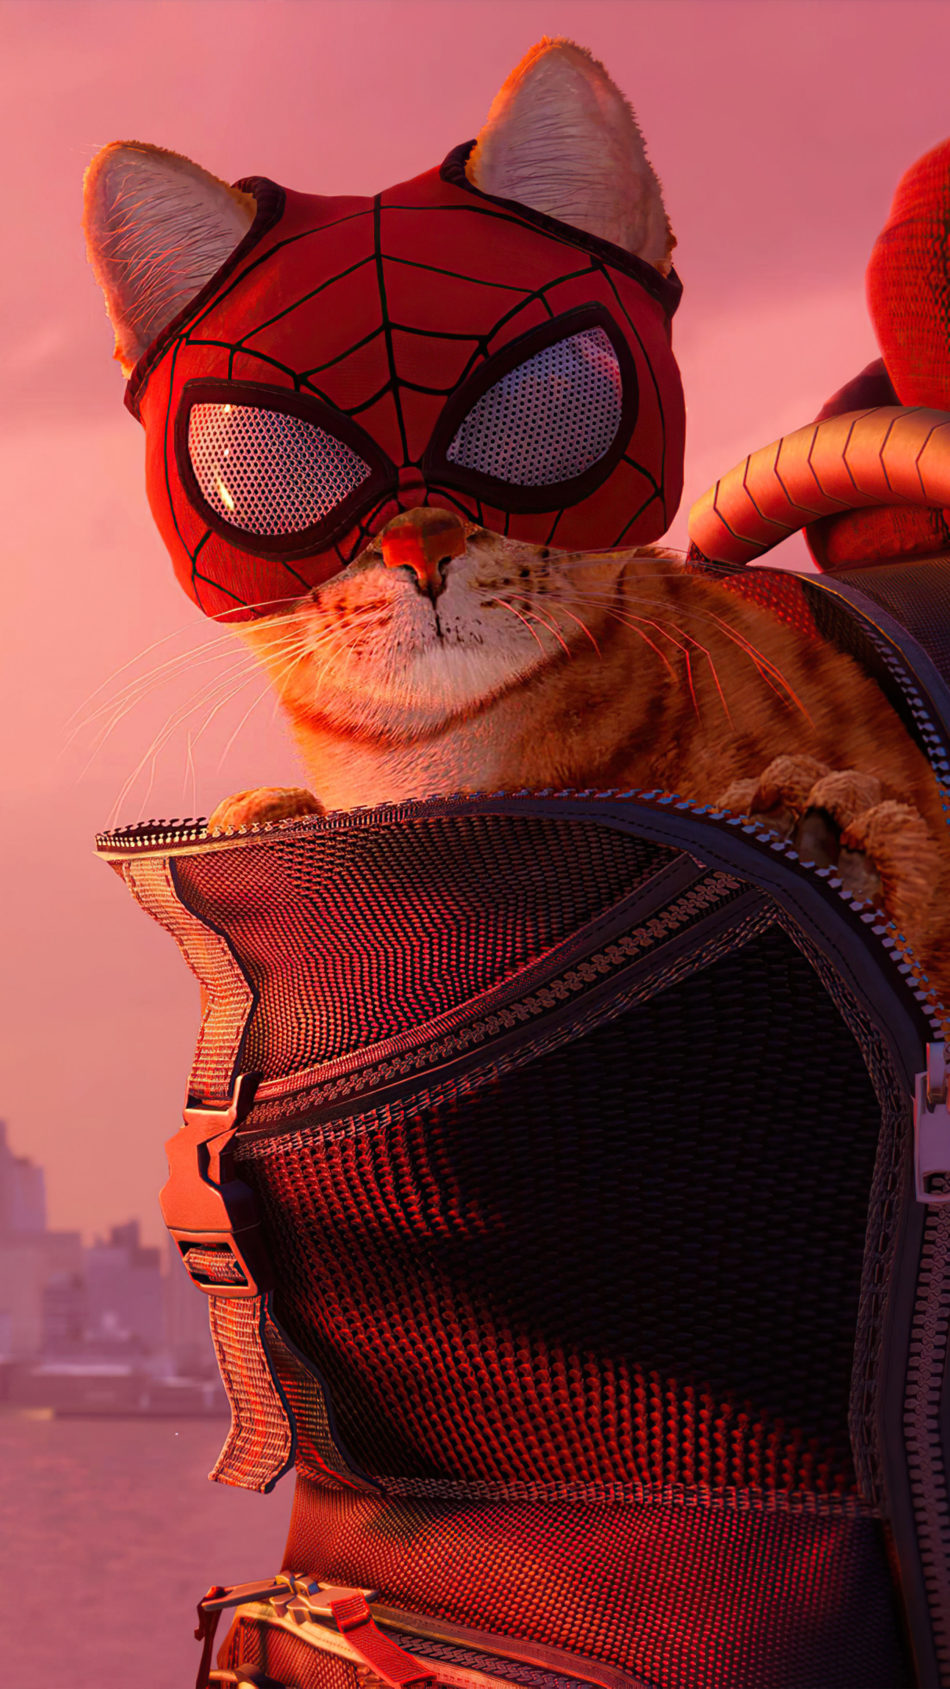 Spider-cat Spider-man Miles Morales 2021 Game 4K Ultra HD Mobile Wallpaper